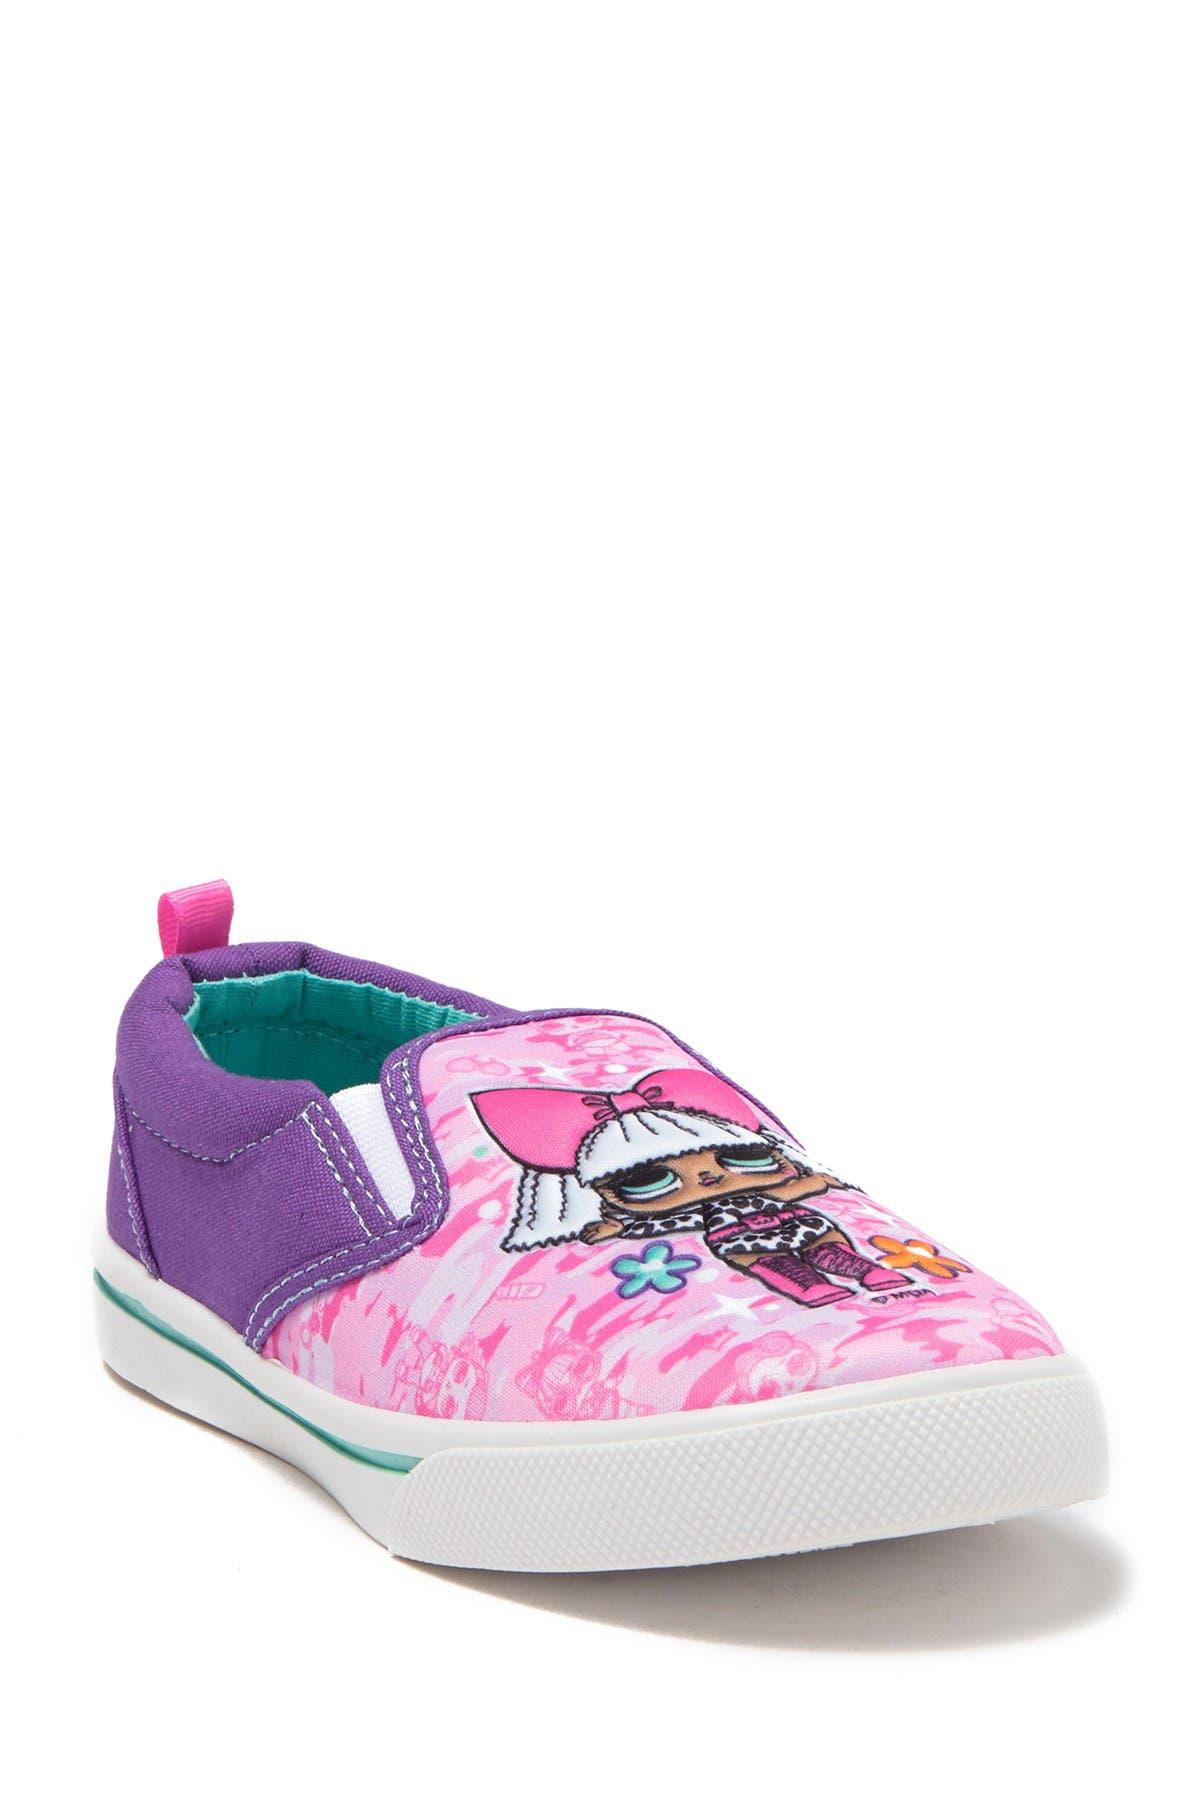 SG Footwear   LOL Surprise Slip-On